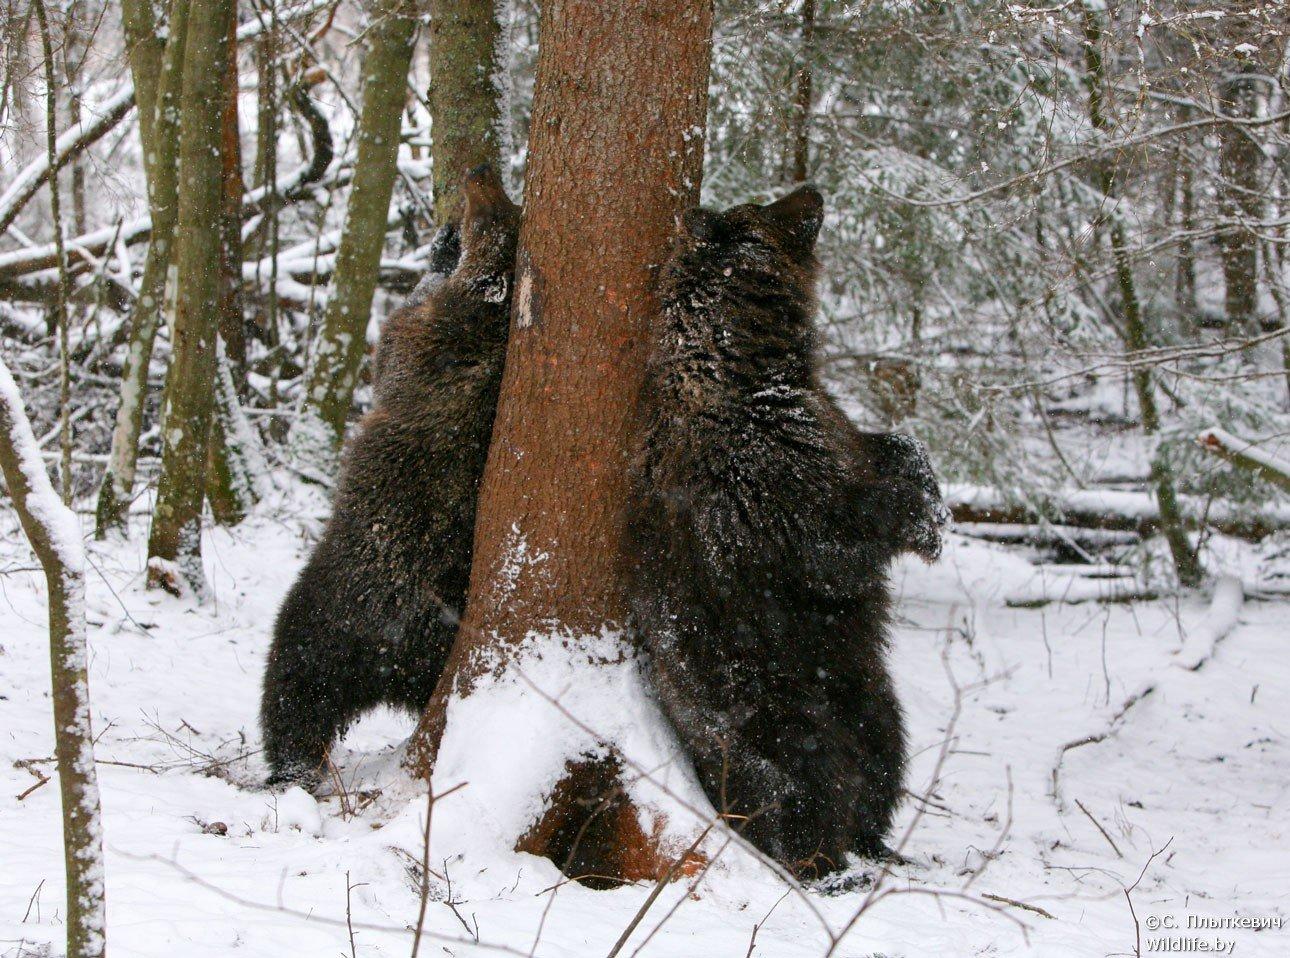 фото меток медведей на деревьях ансамбля